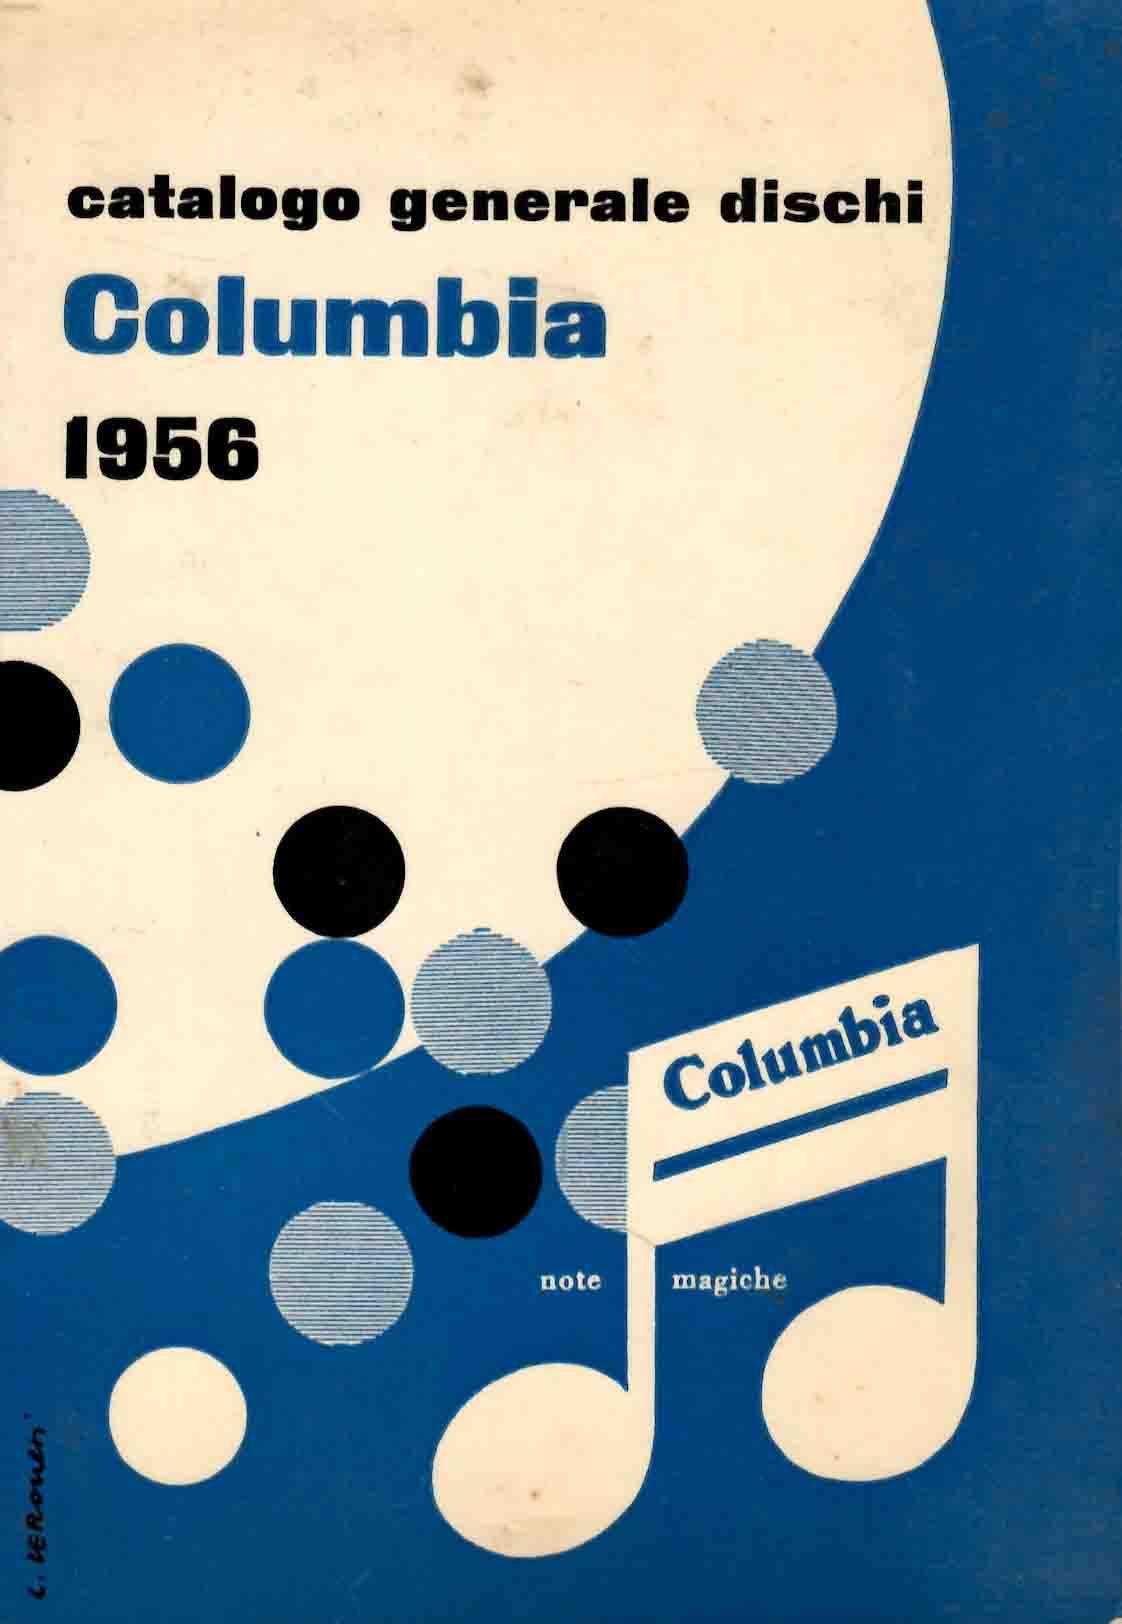 Catalogo generale dischi Columbia